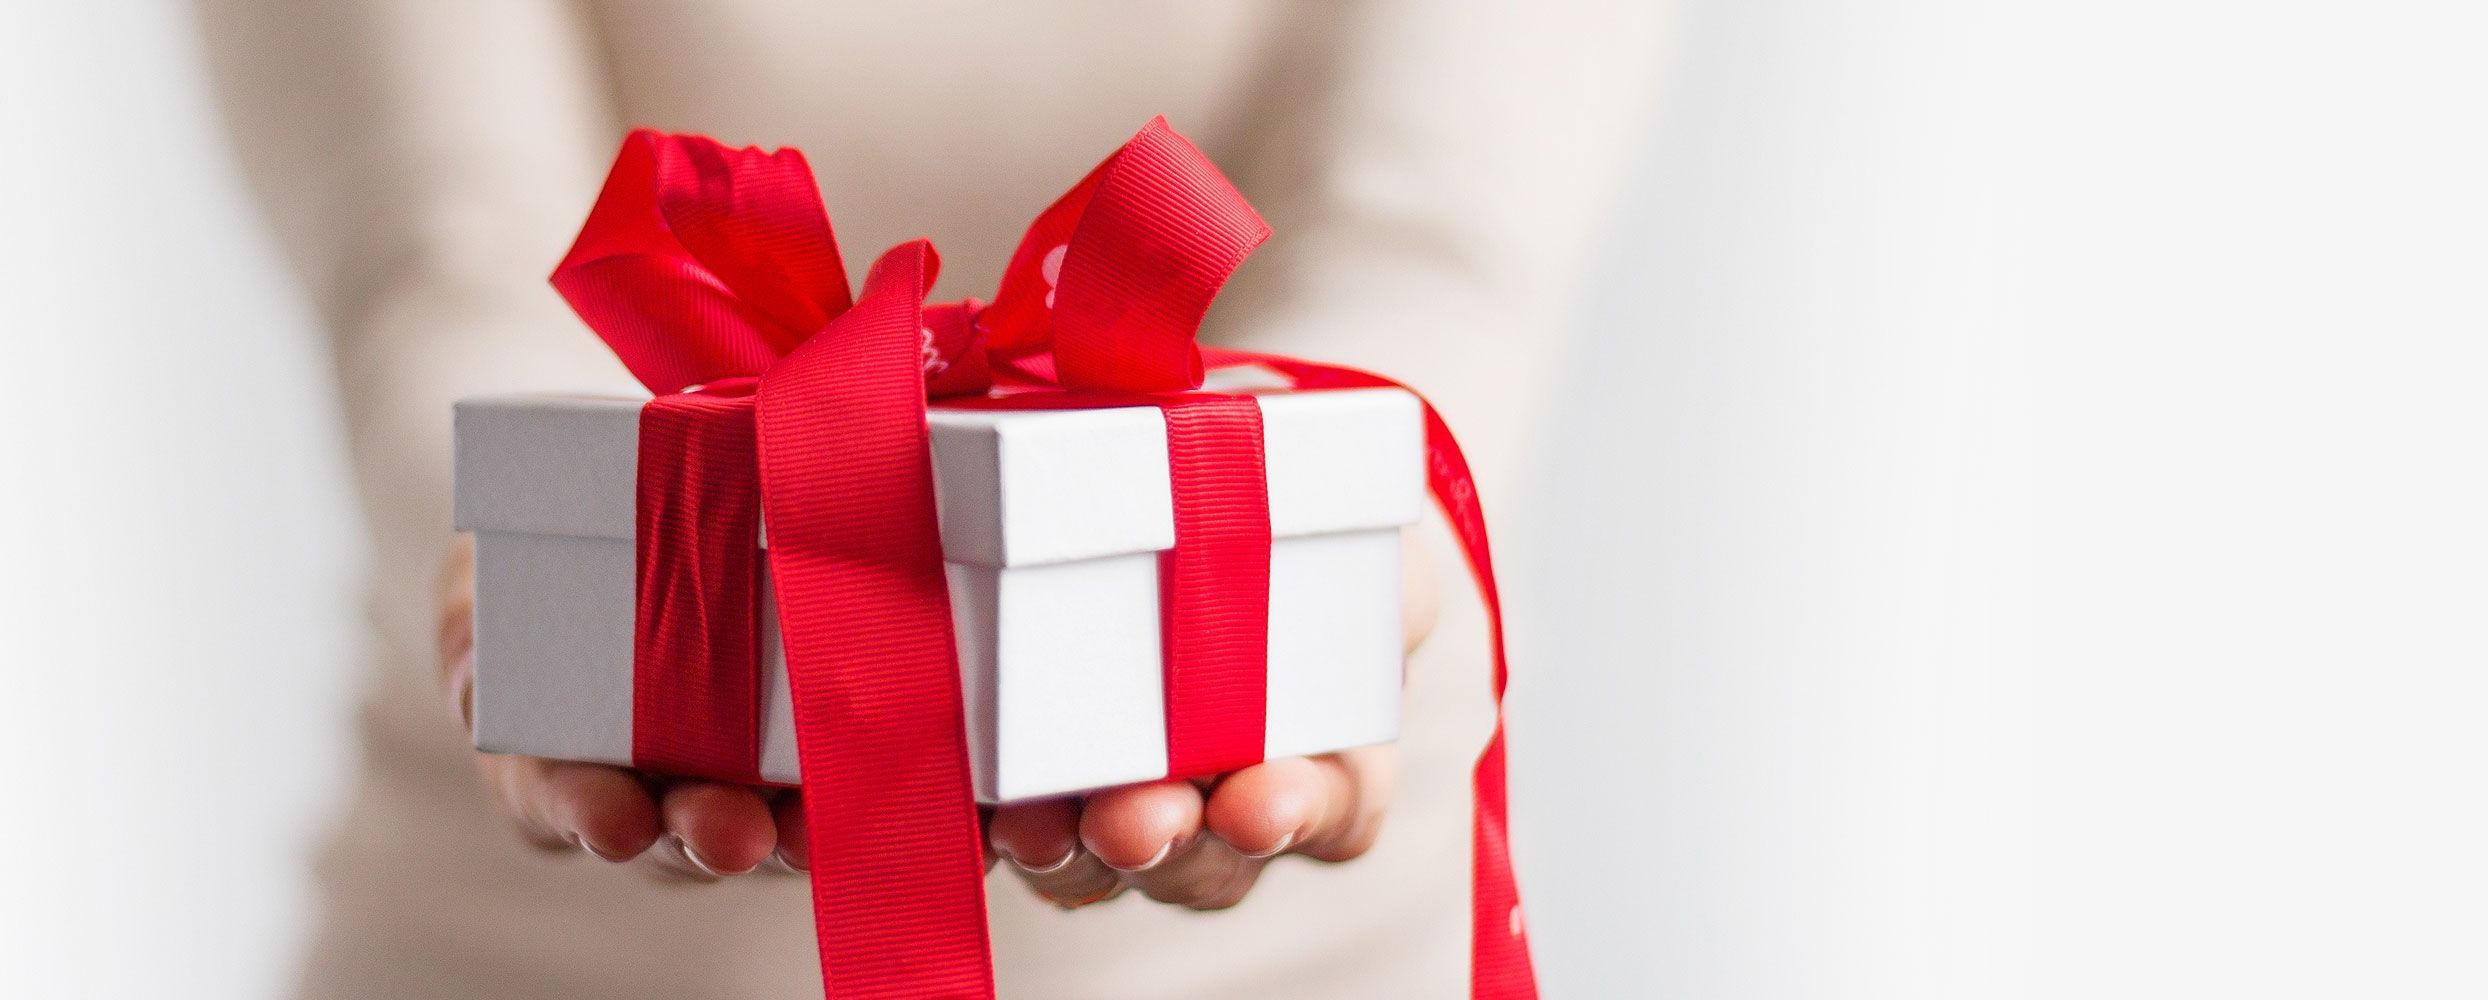 paperb valentine day gift - 1400×664